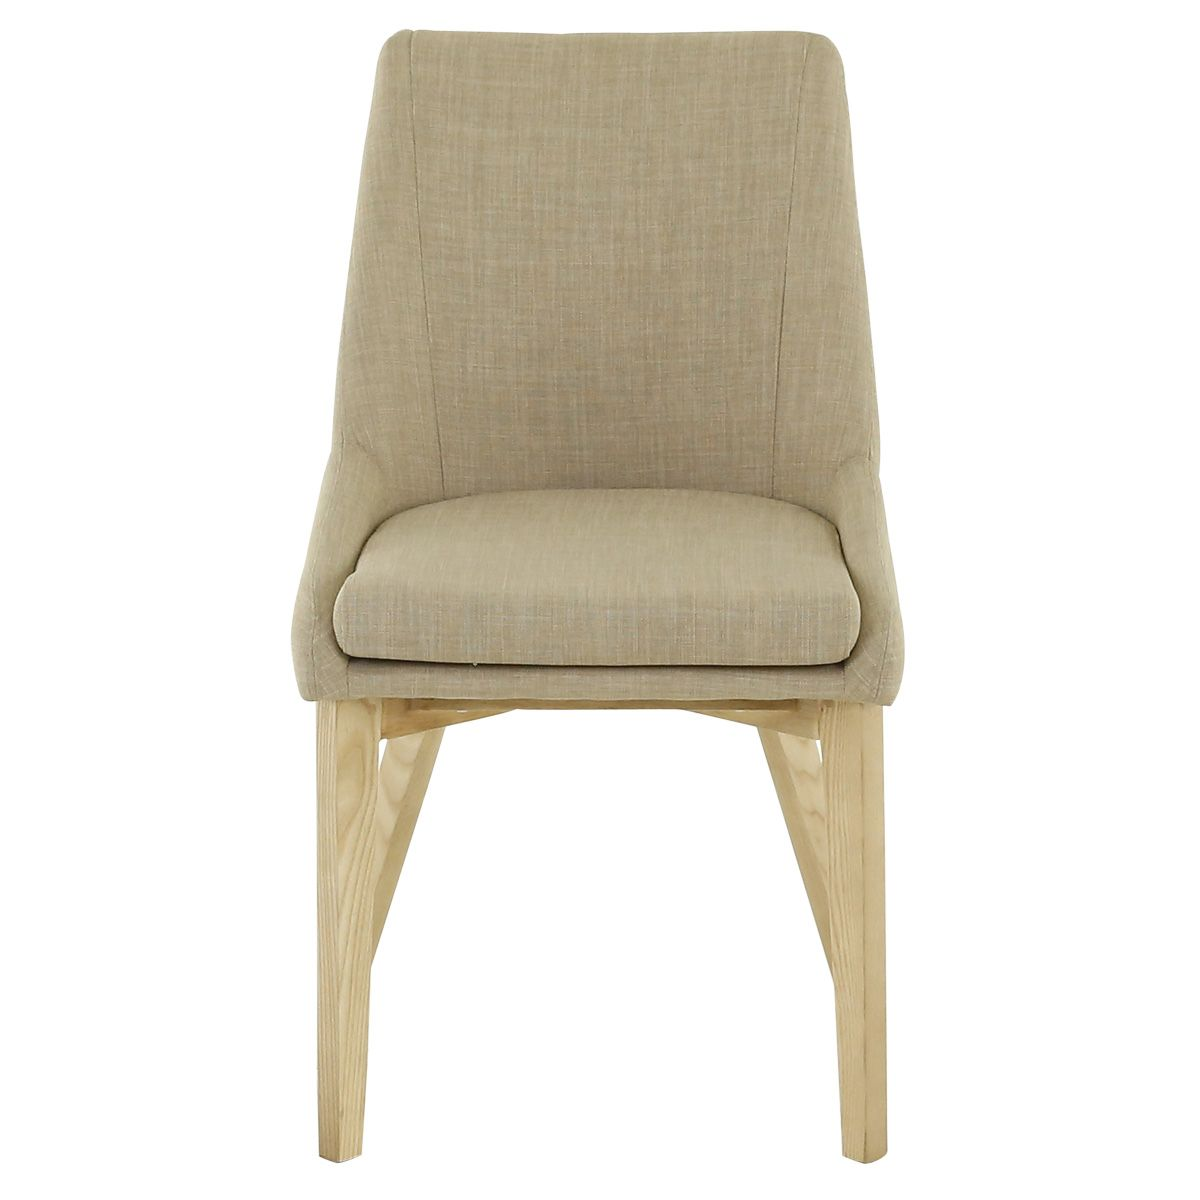 Chaise tissu et bois de frêne  beige